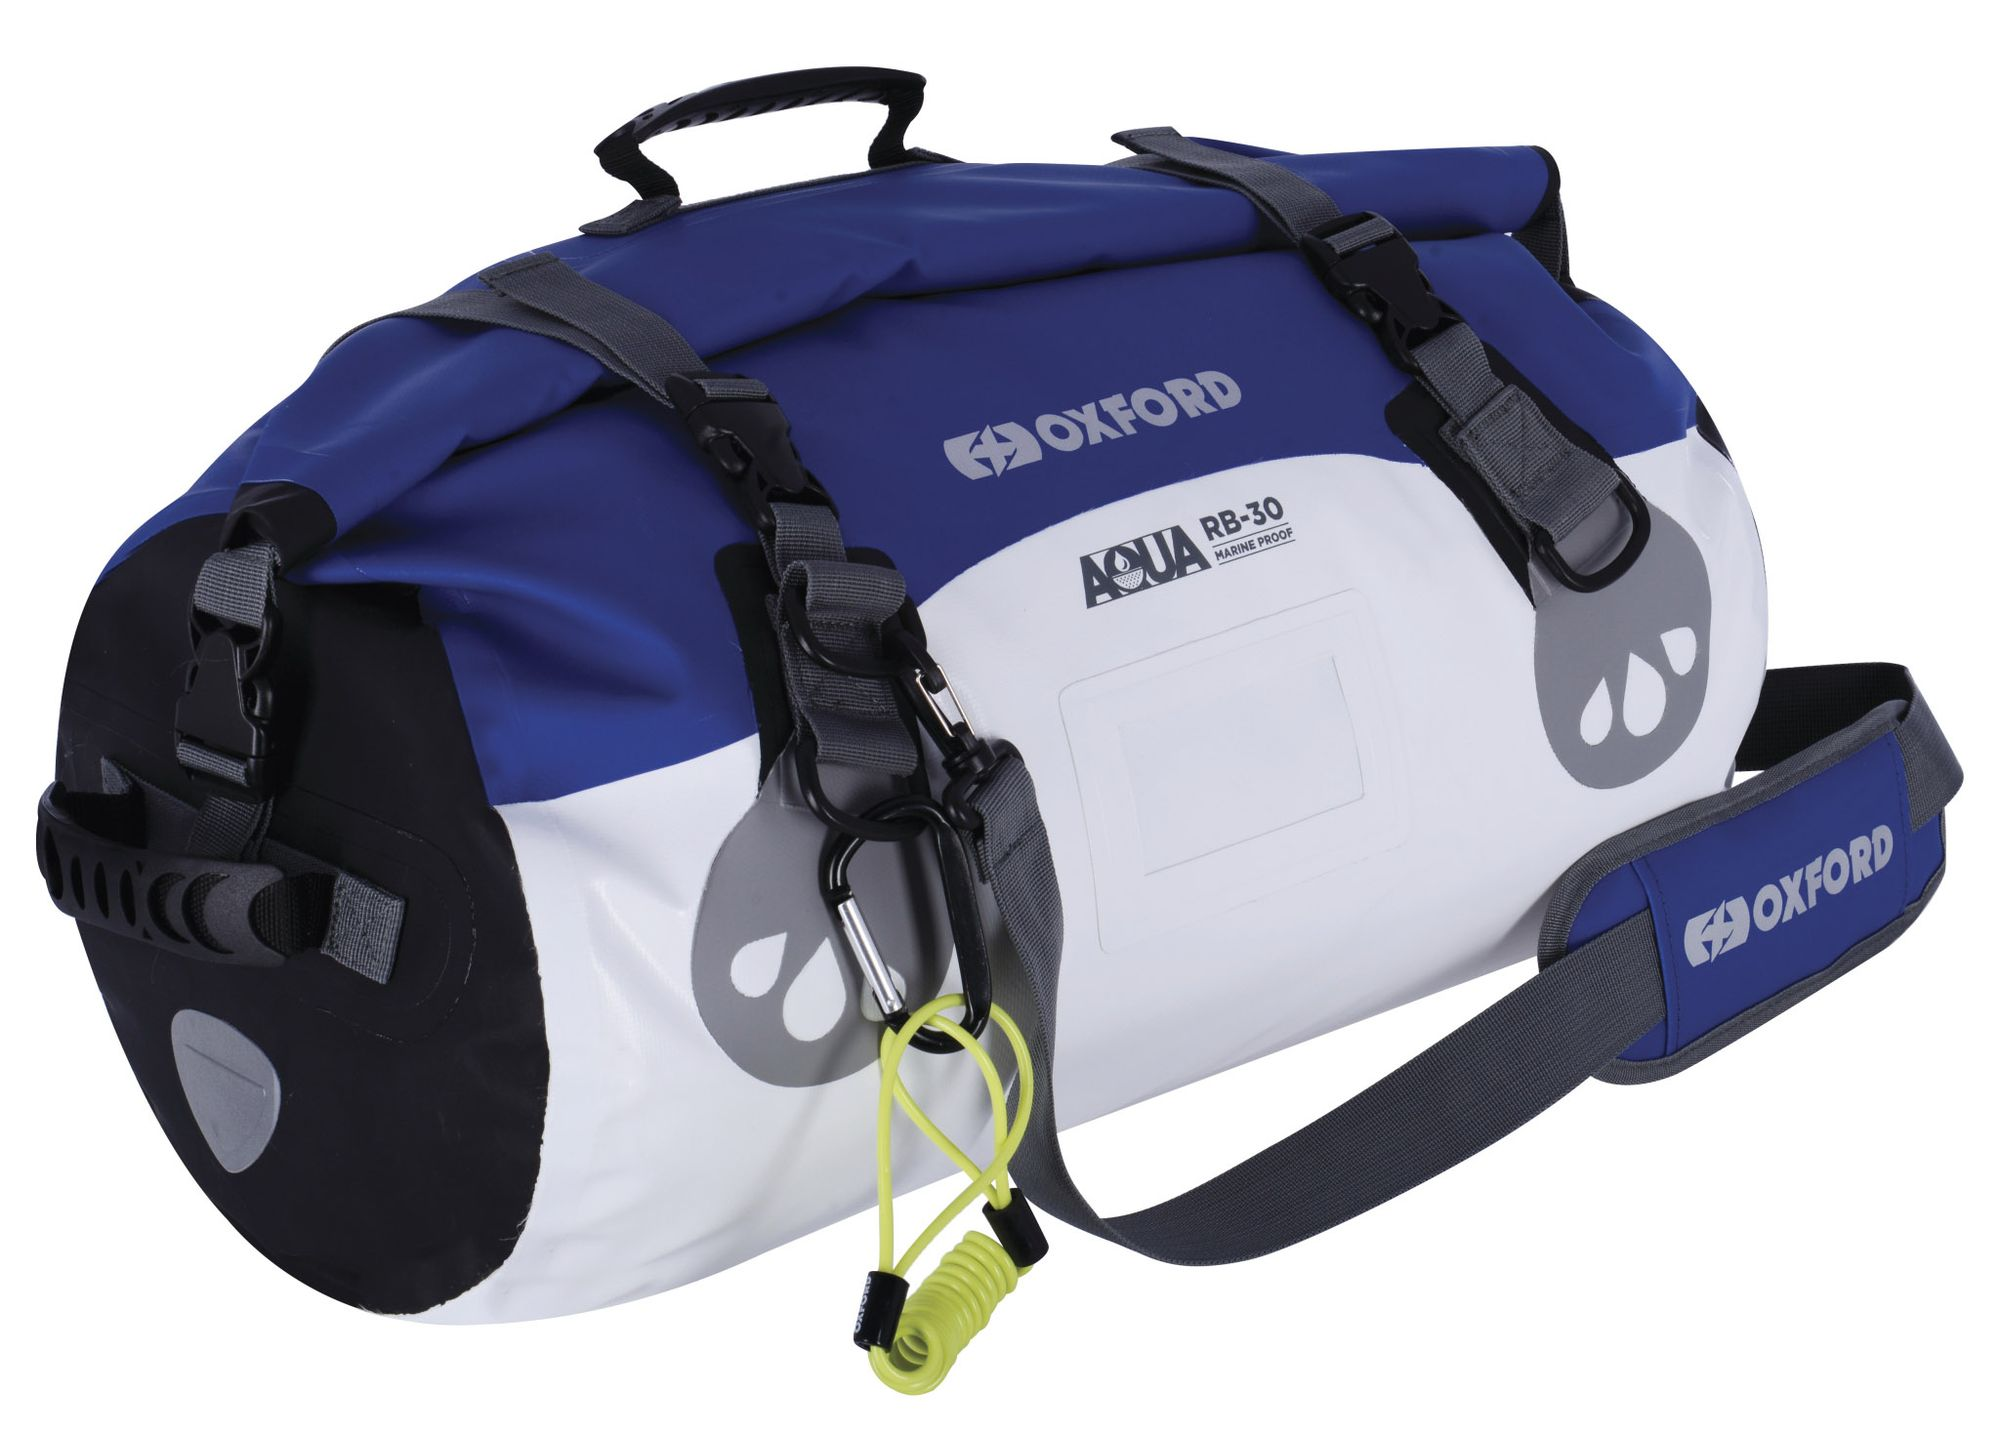 Vodotěsný vak Oxford Aqua RB-30 Roll Bag bílo-modrý